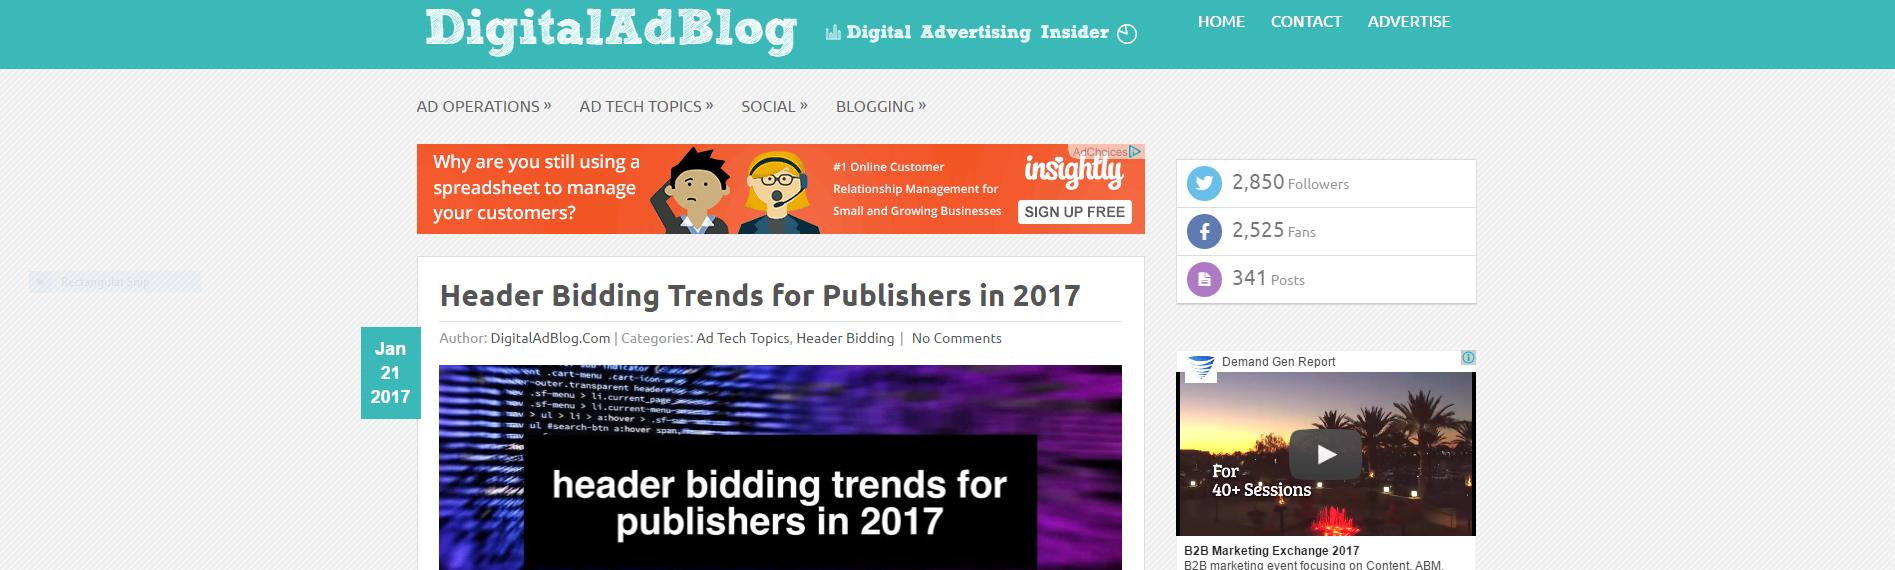 digitaladblog